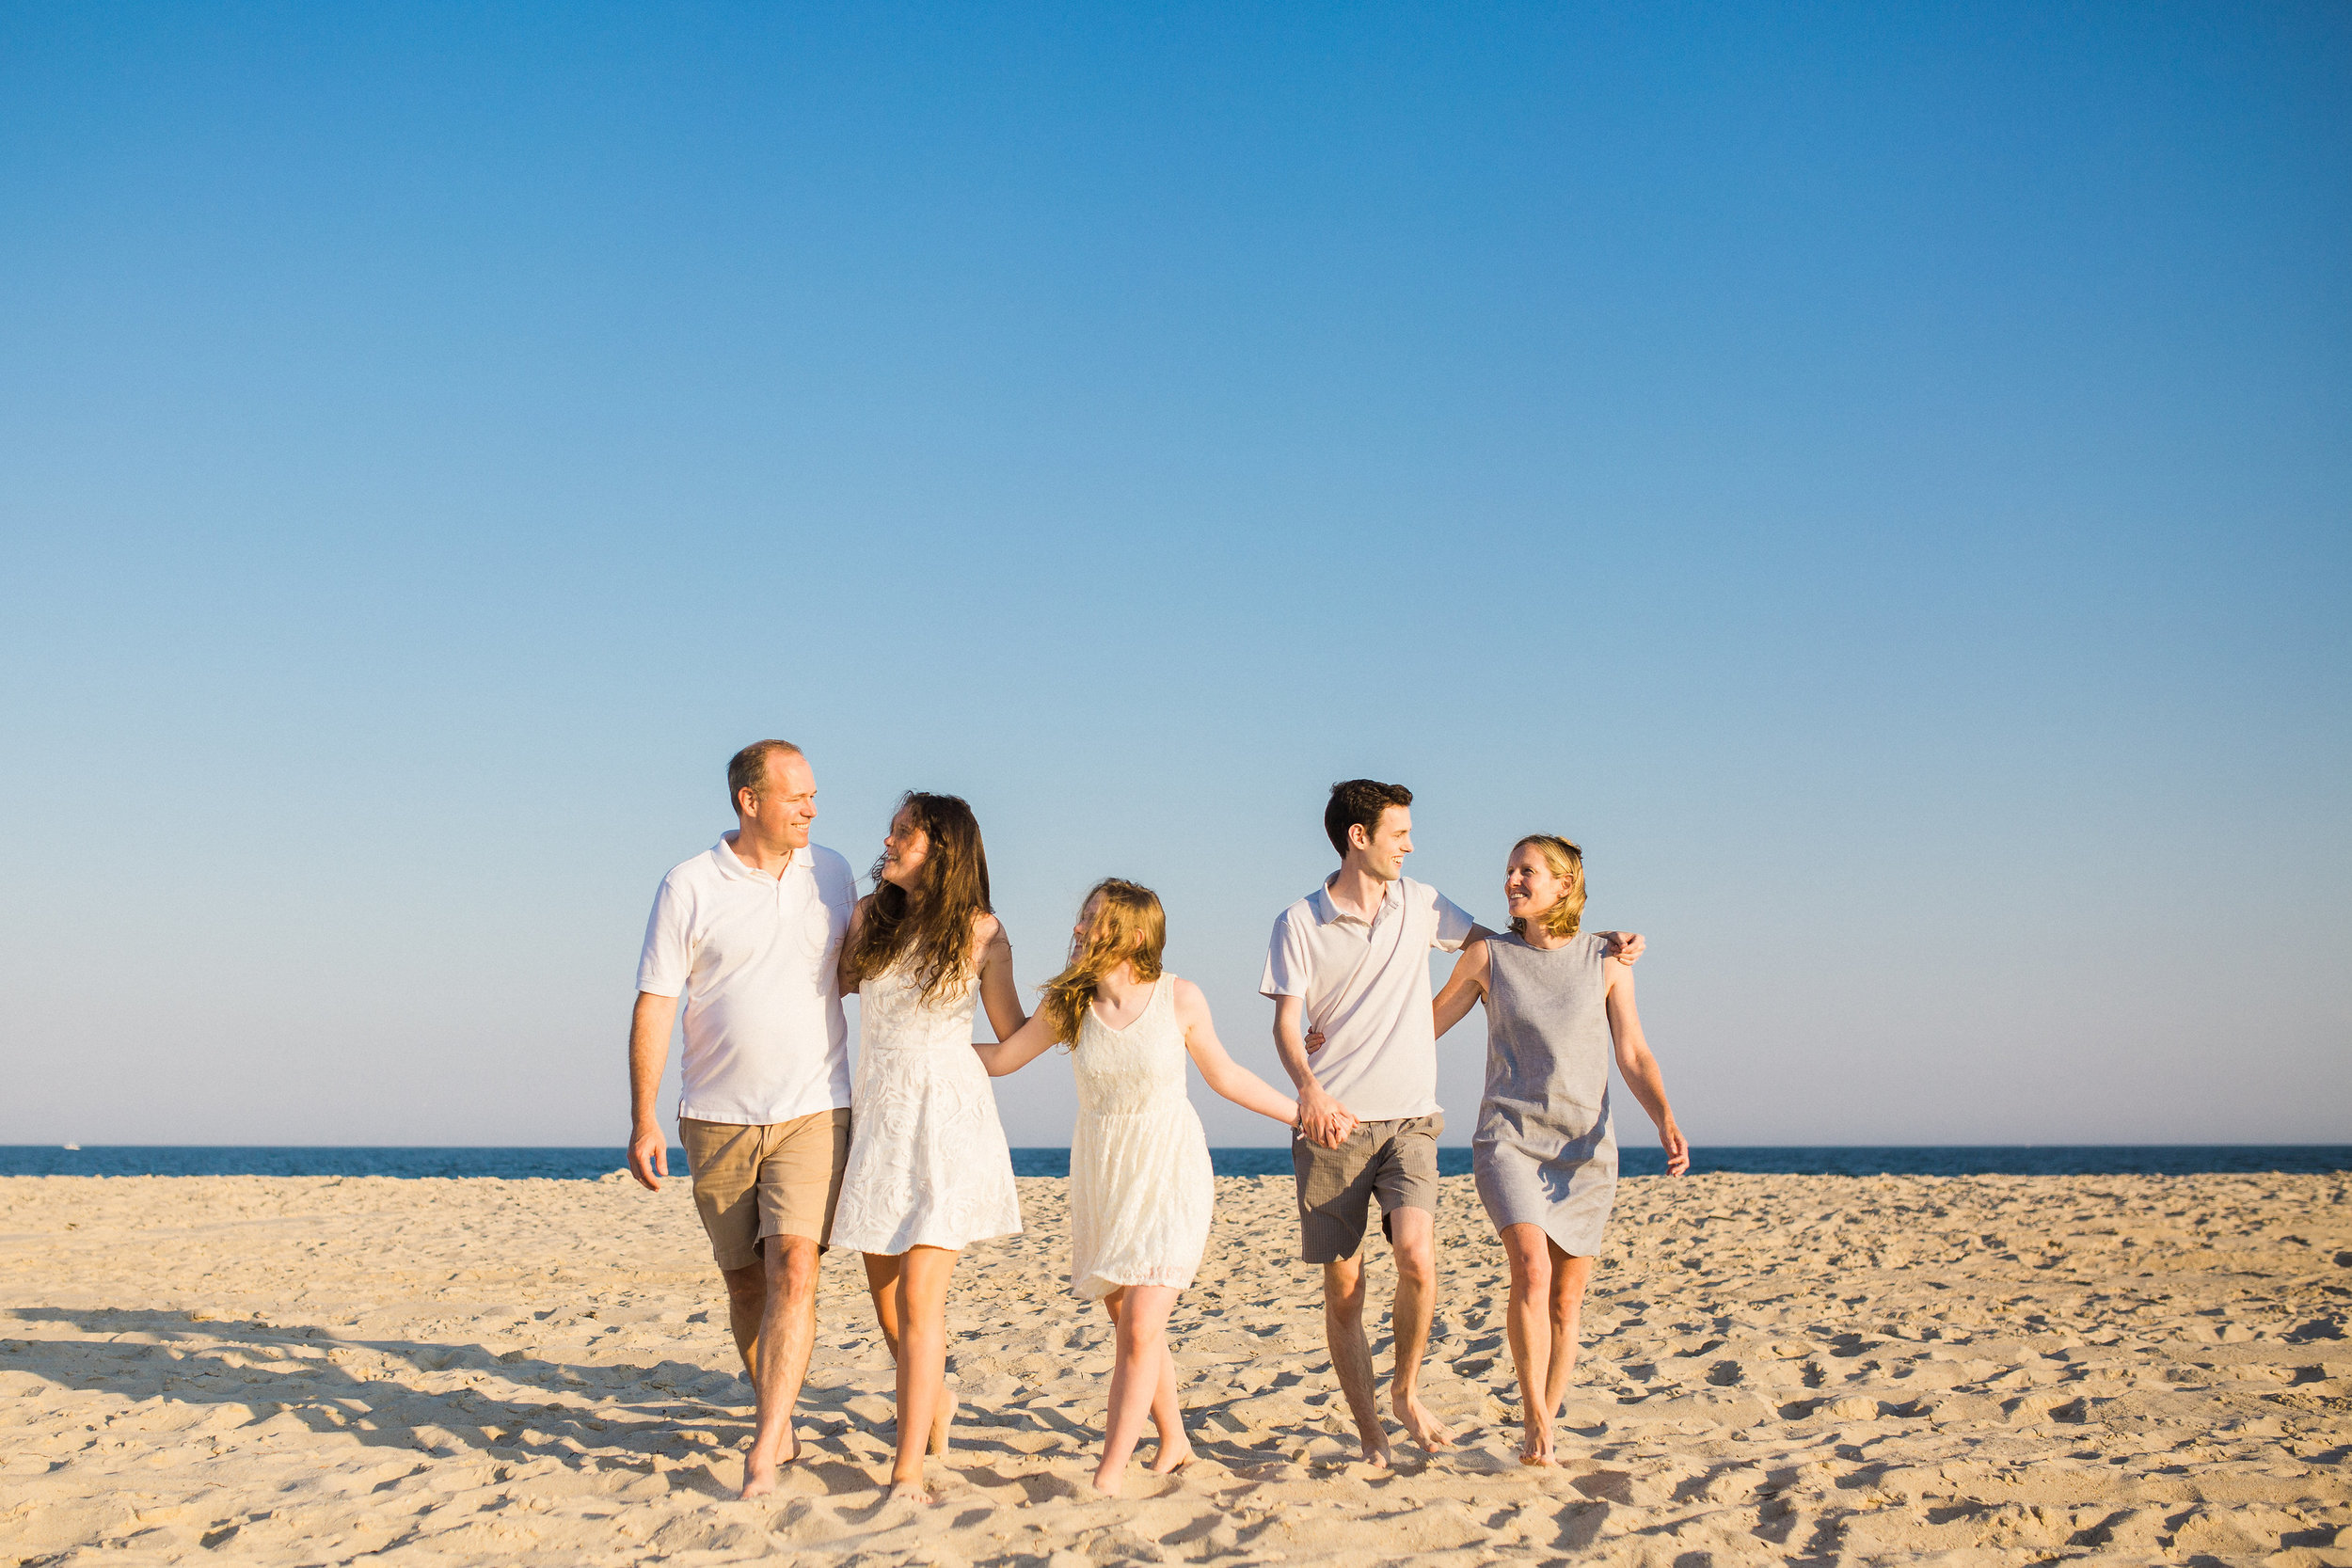 hamptons_beach_family_child_photographer-25.jpg